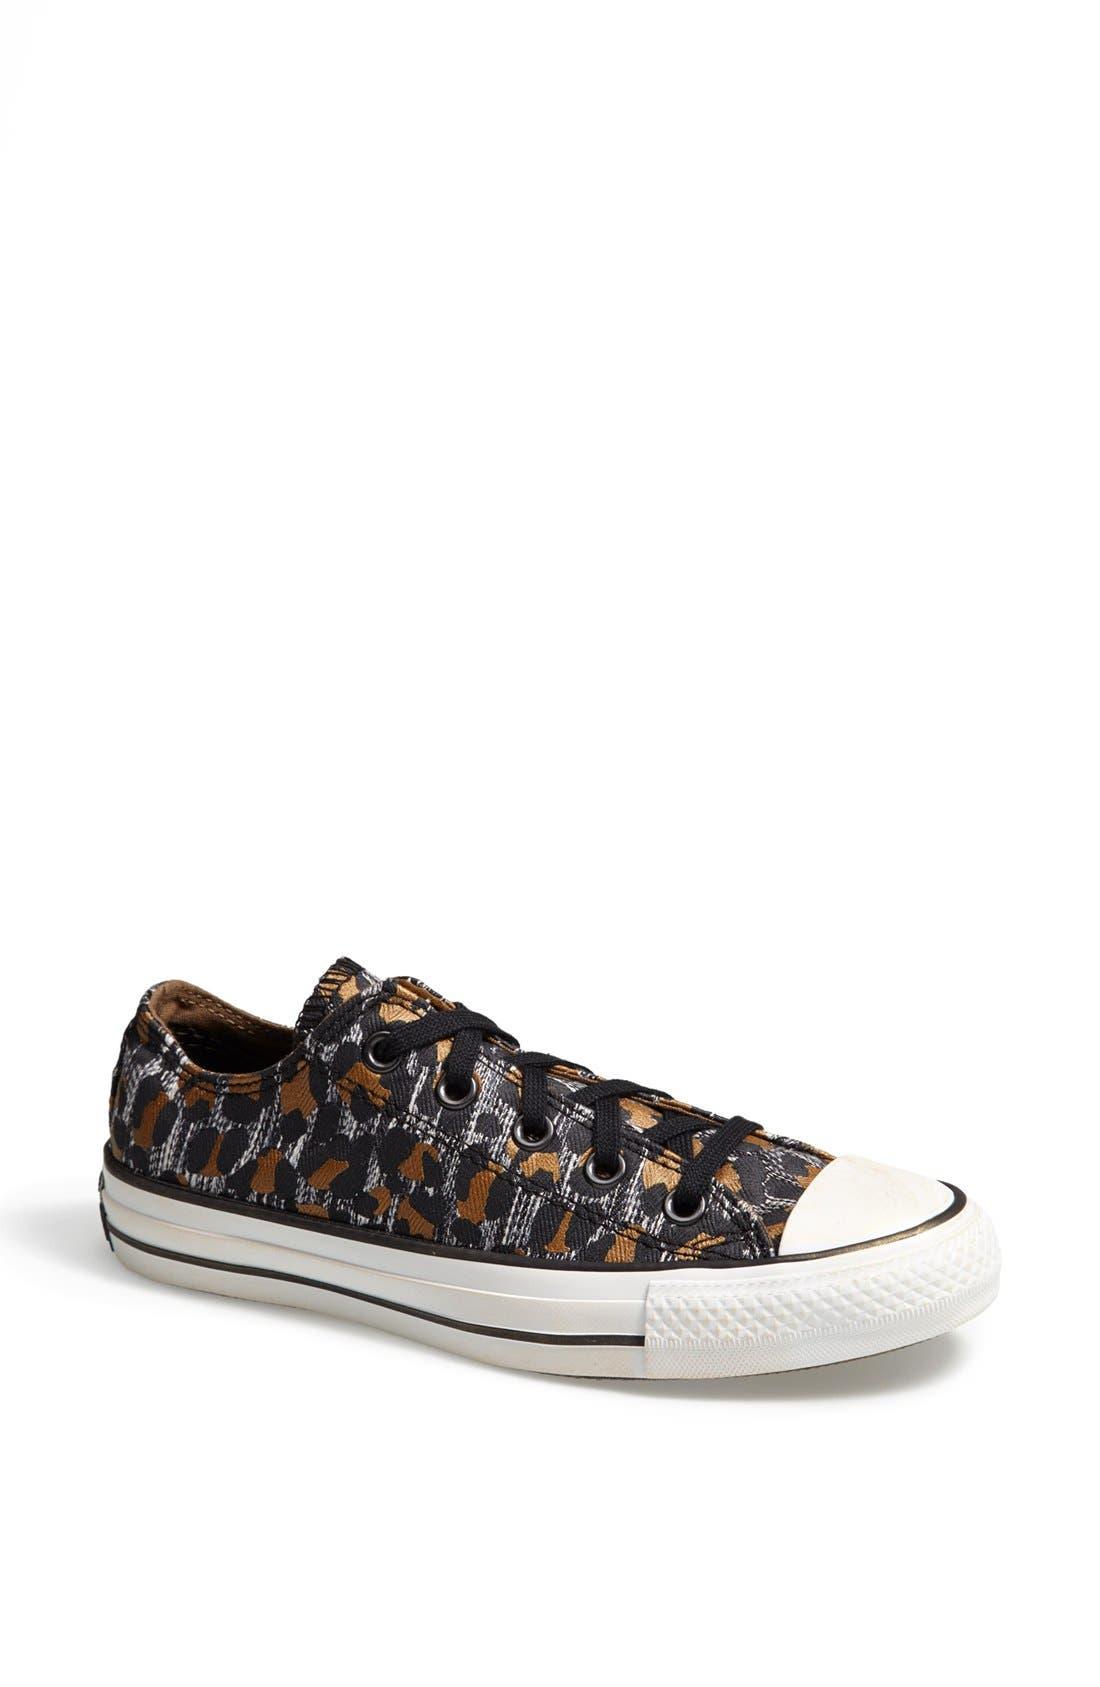 Main Image - Converse Chuck Taylor® All Star® Low Print Sneaker (Women)